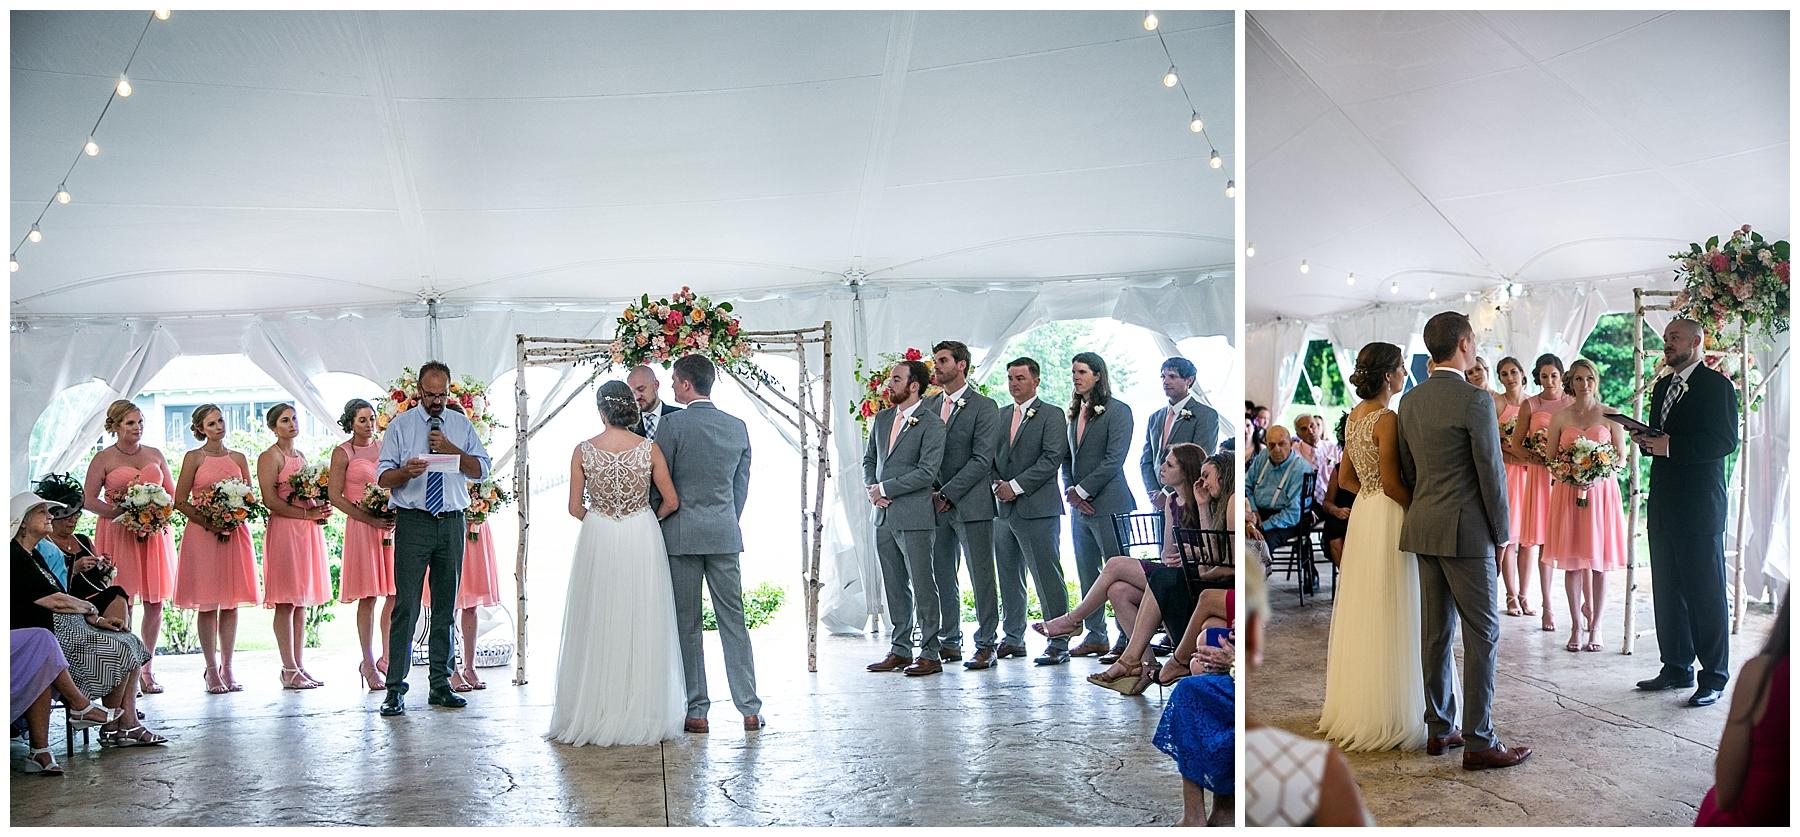 Chelsea Phil Bohemia River Overlook Wedding Living Radiant Photography photos_0107.jpg